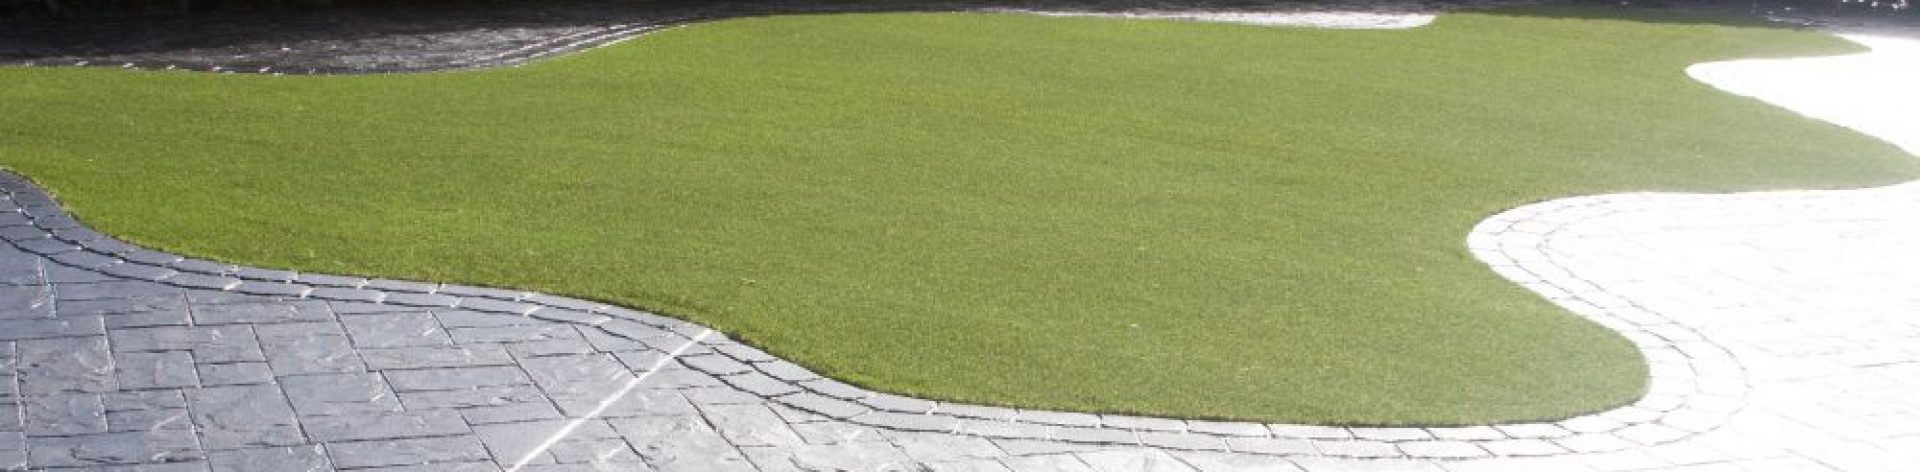 Midlands Artificial Lawns